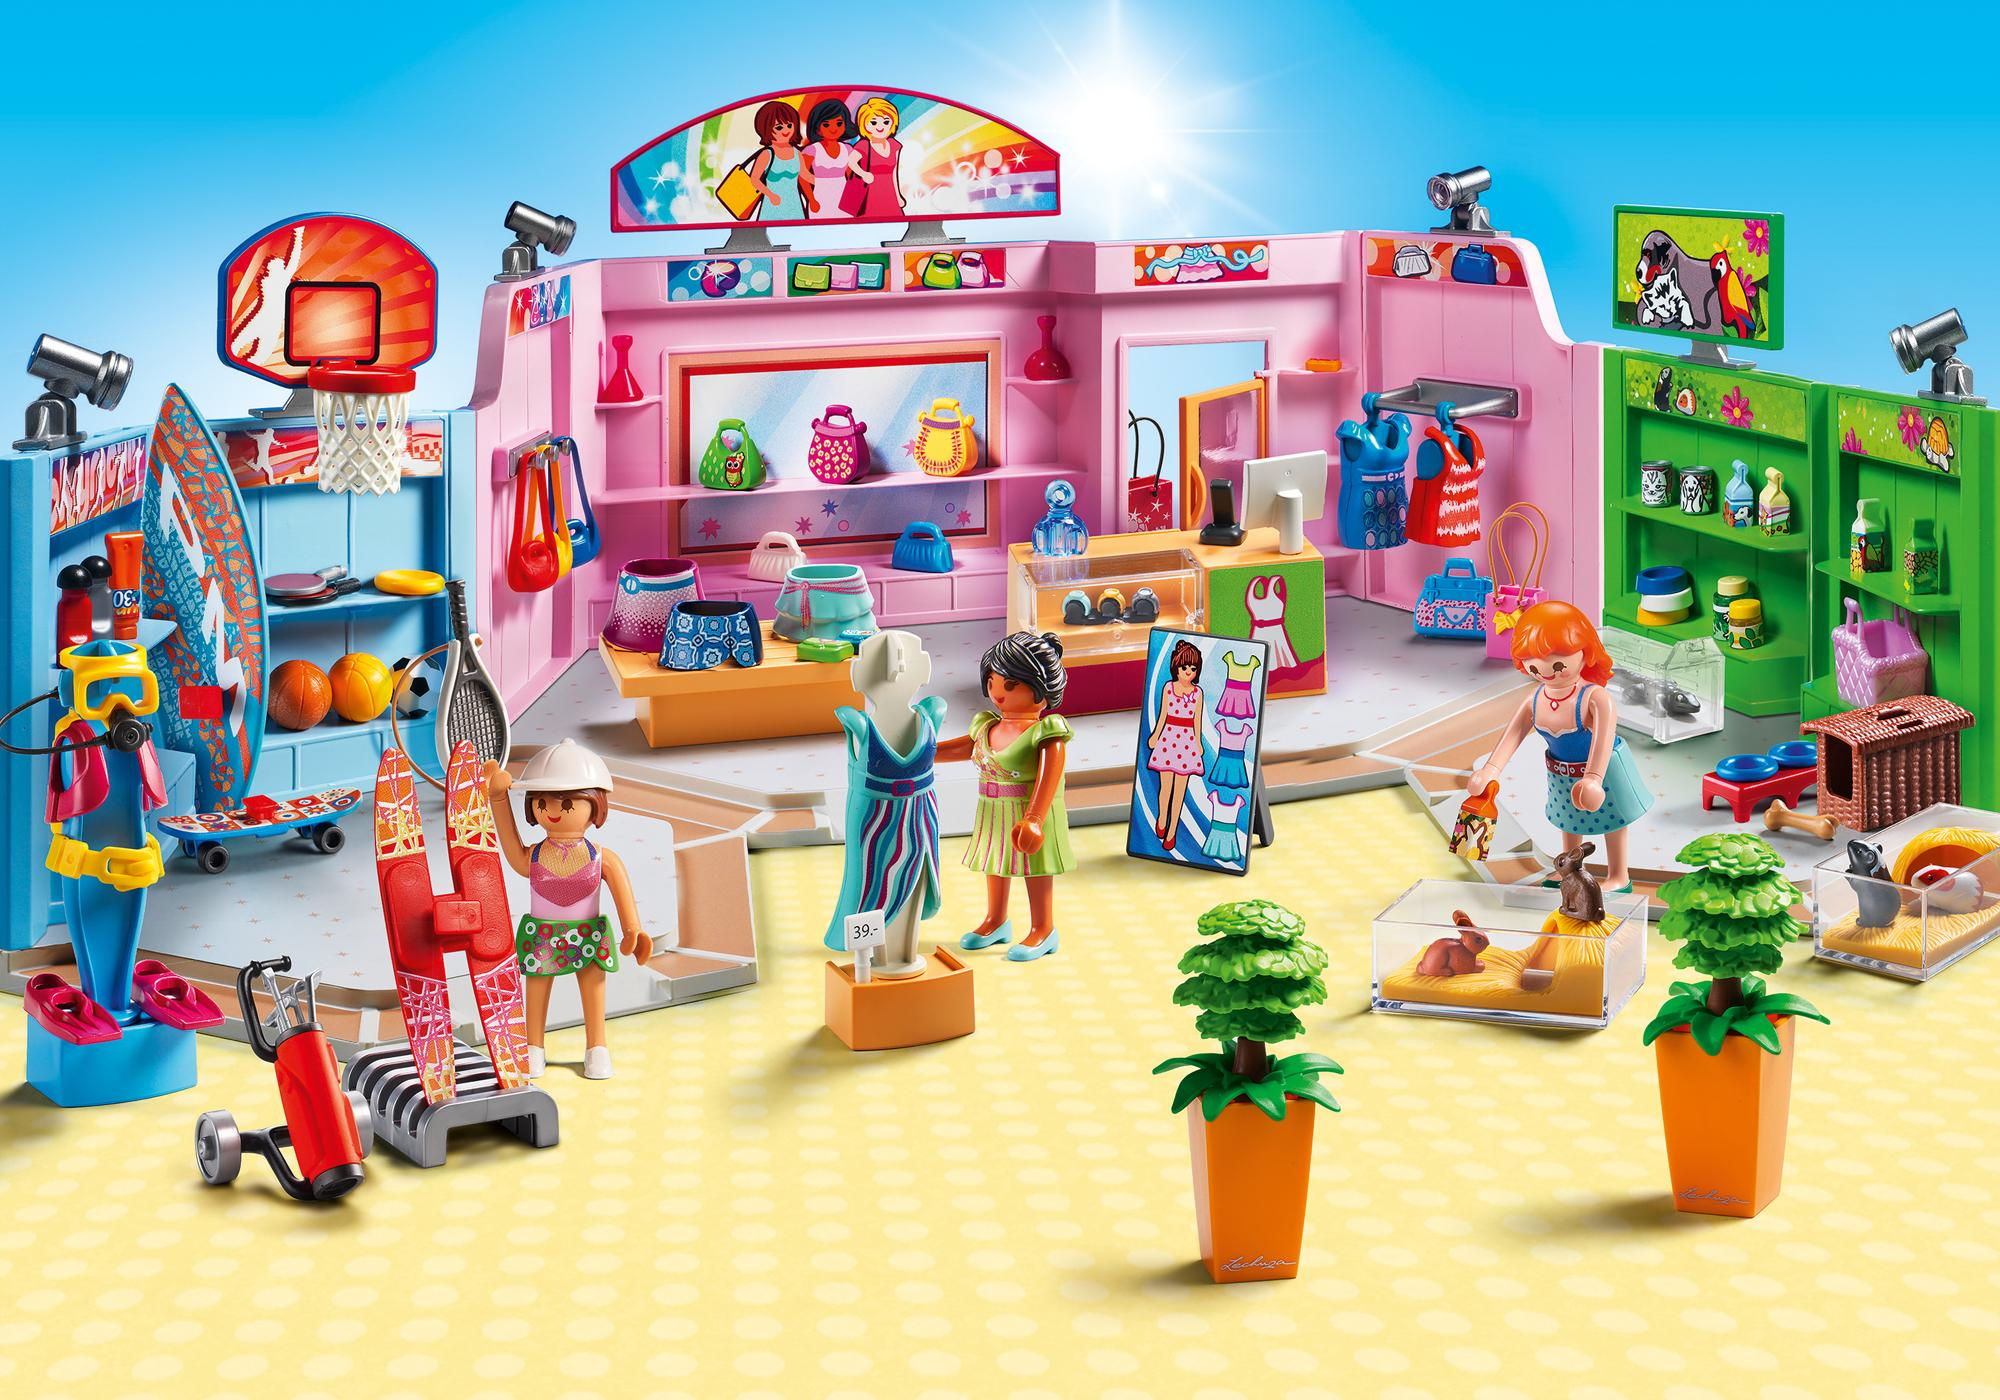 http://media.playmobil.com/i/playmobil/9078_product_detail/Galleria con 3 negozi